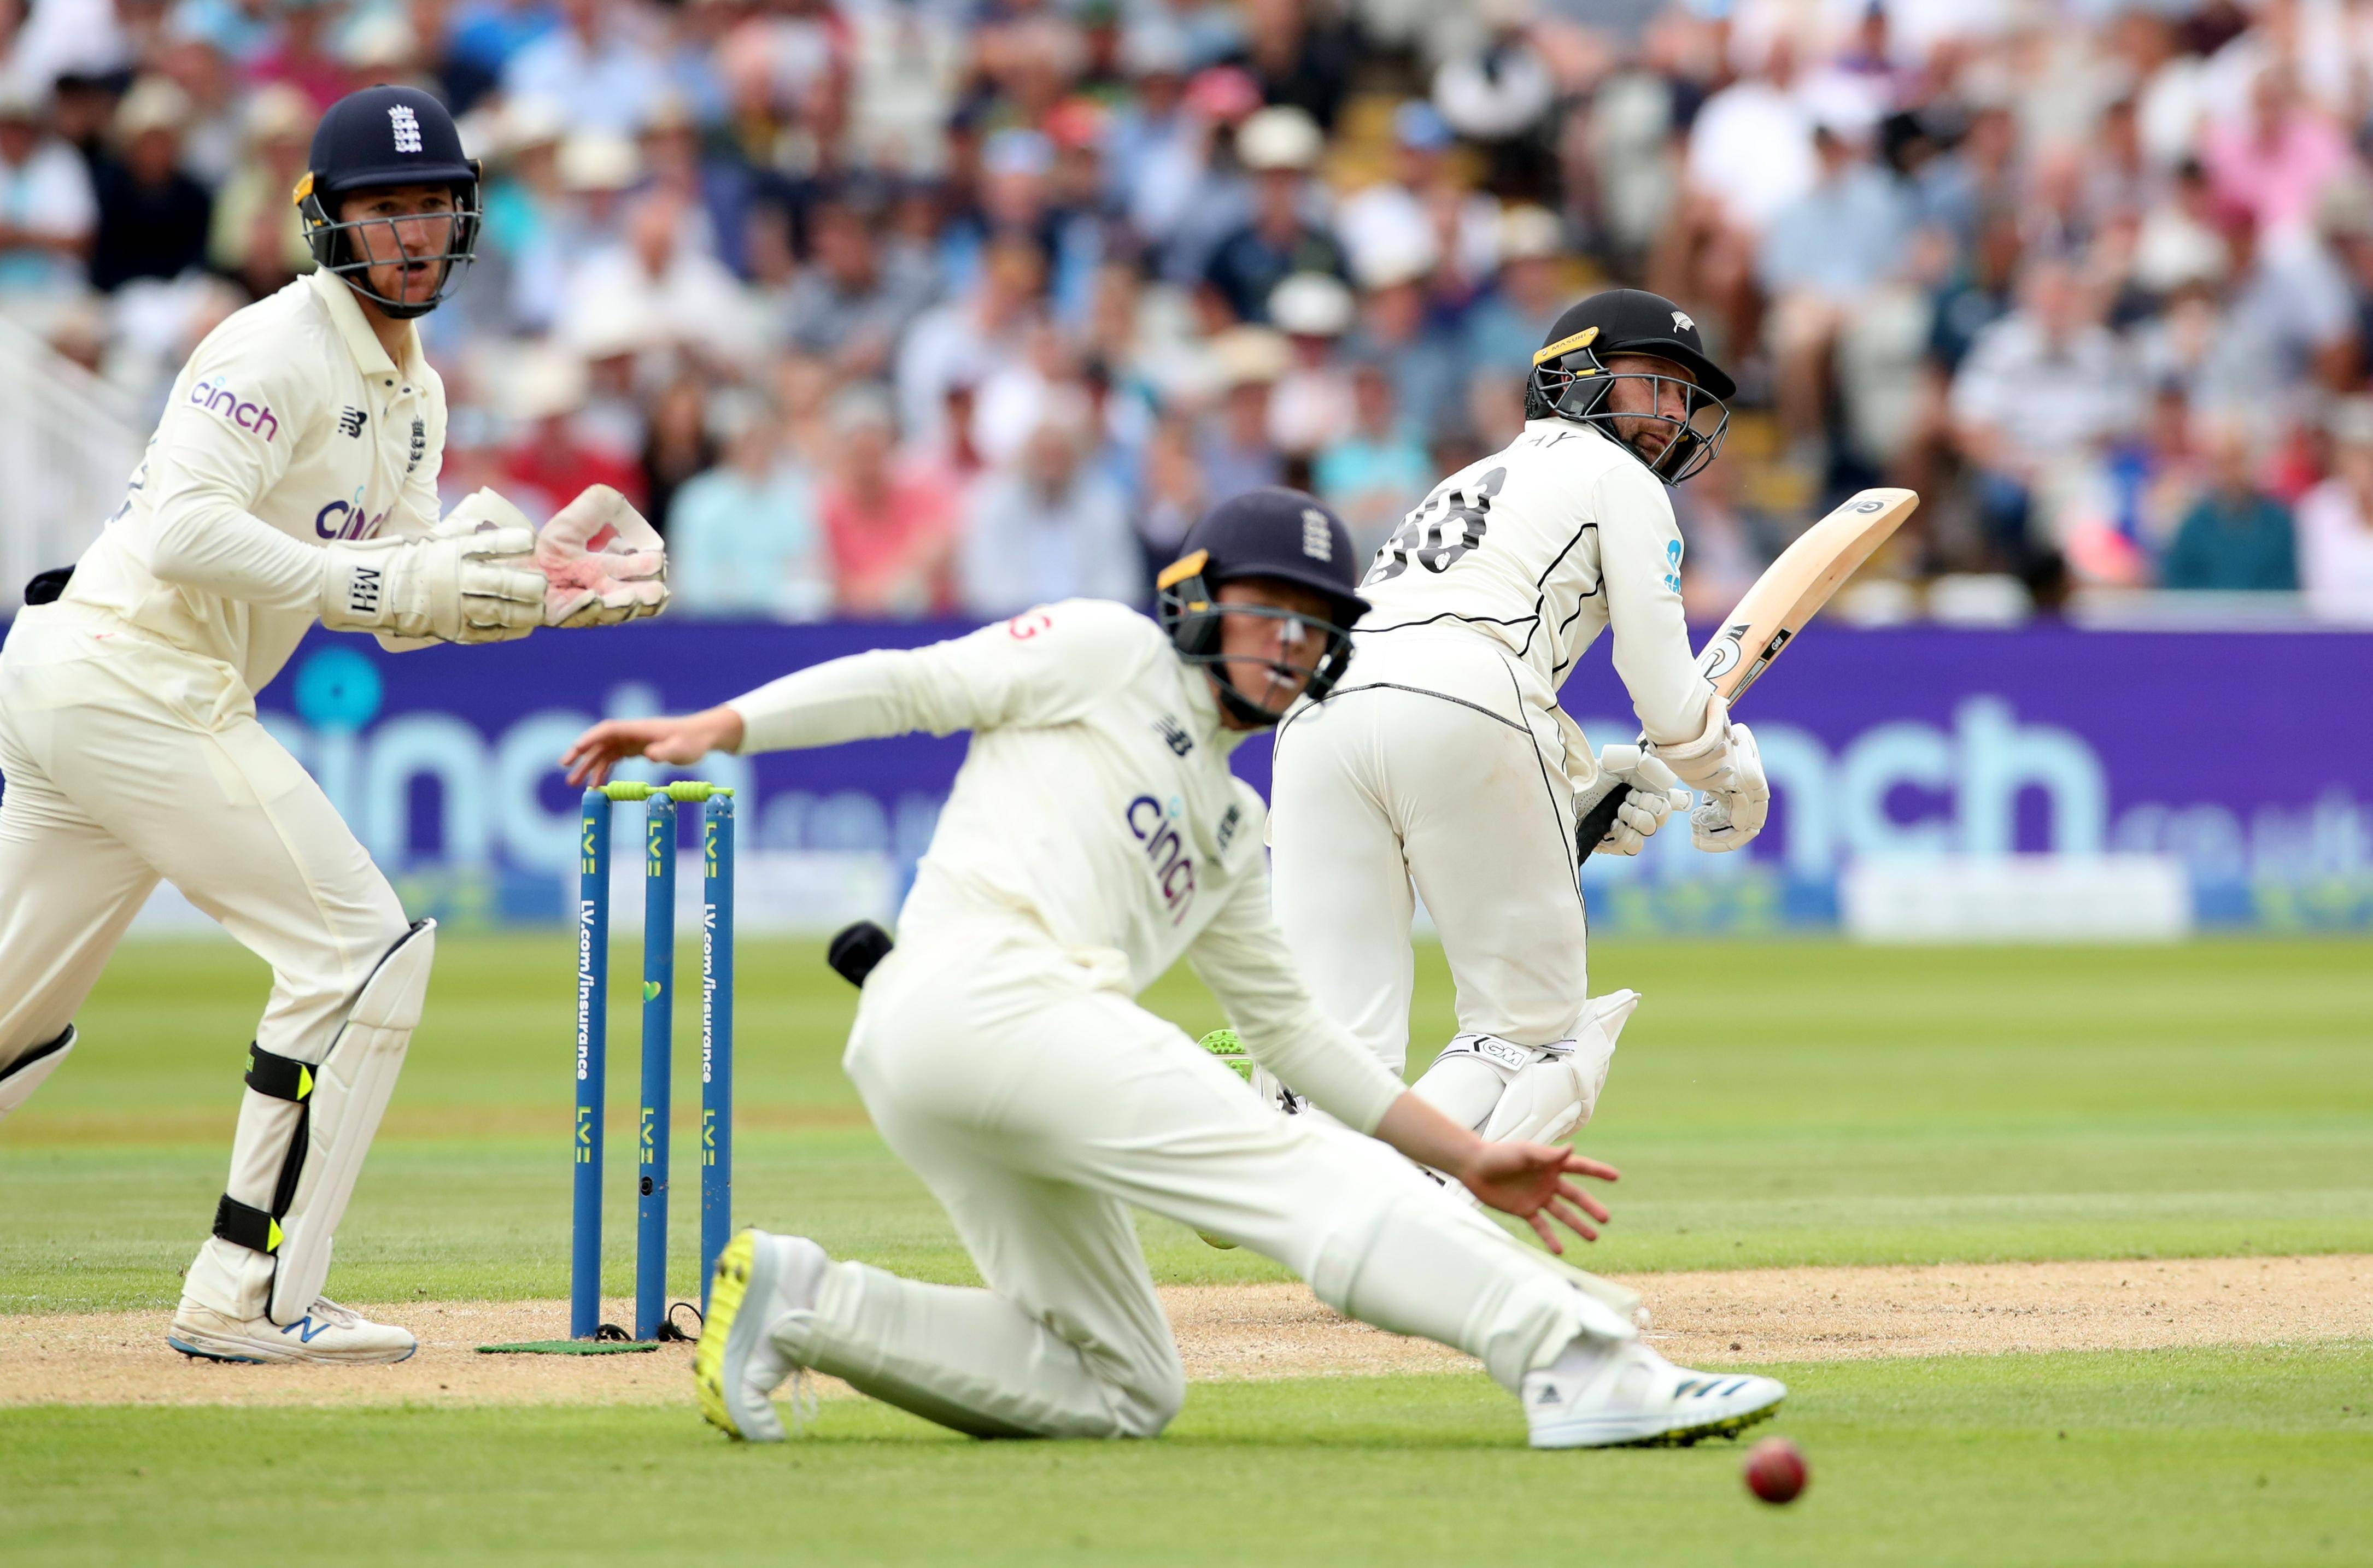 New Zealand's Conway keeps England at bay again